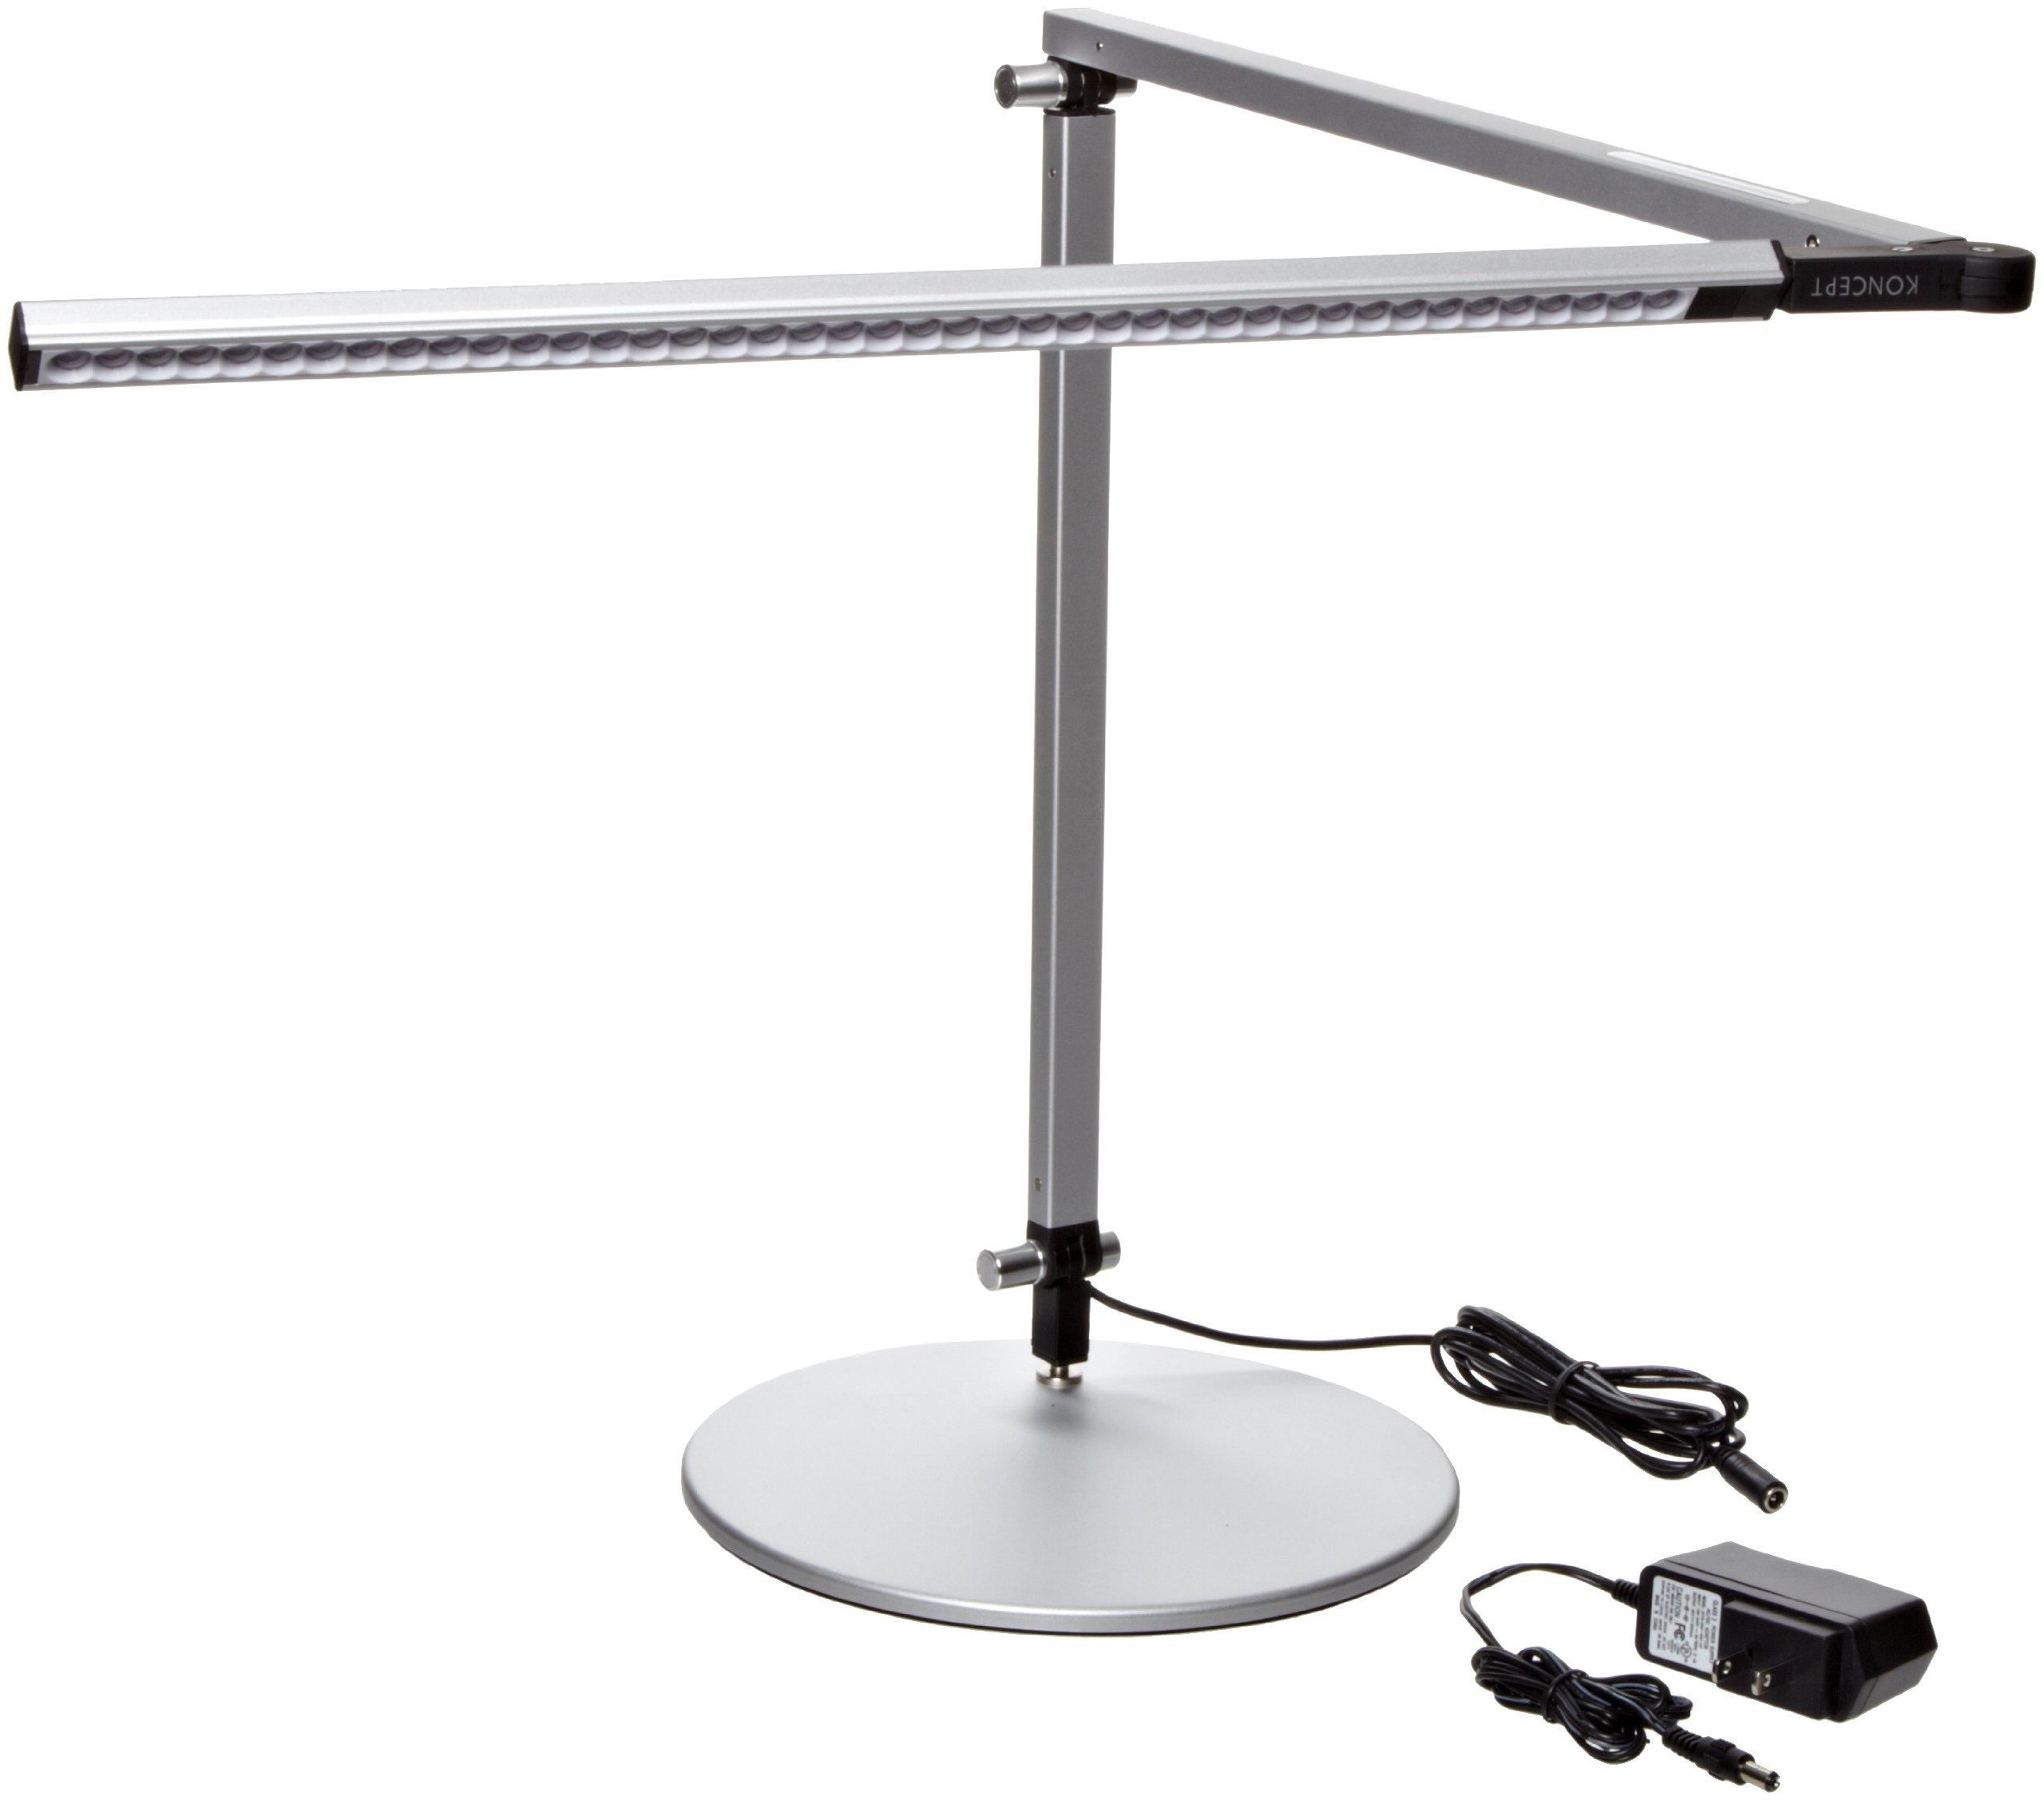 Koncept AR3000-W-SIL-DSK Z-Bar LED Desk Lamp, Warm Light, Silver by Koncept